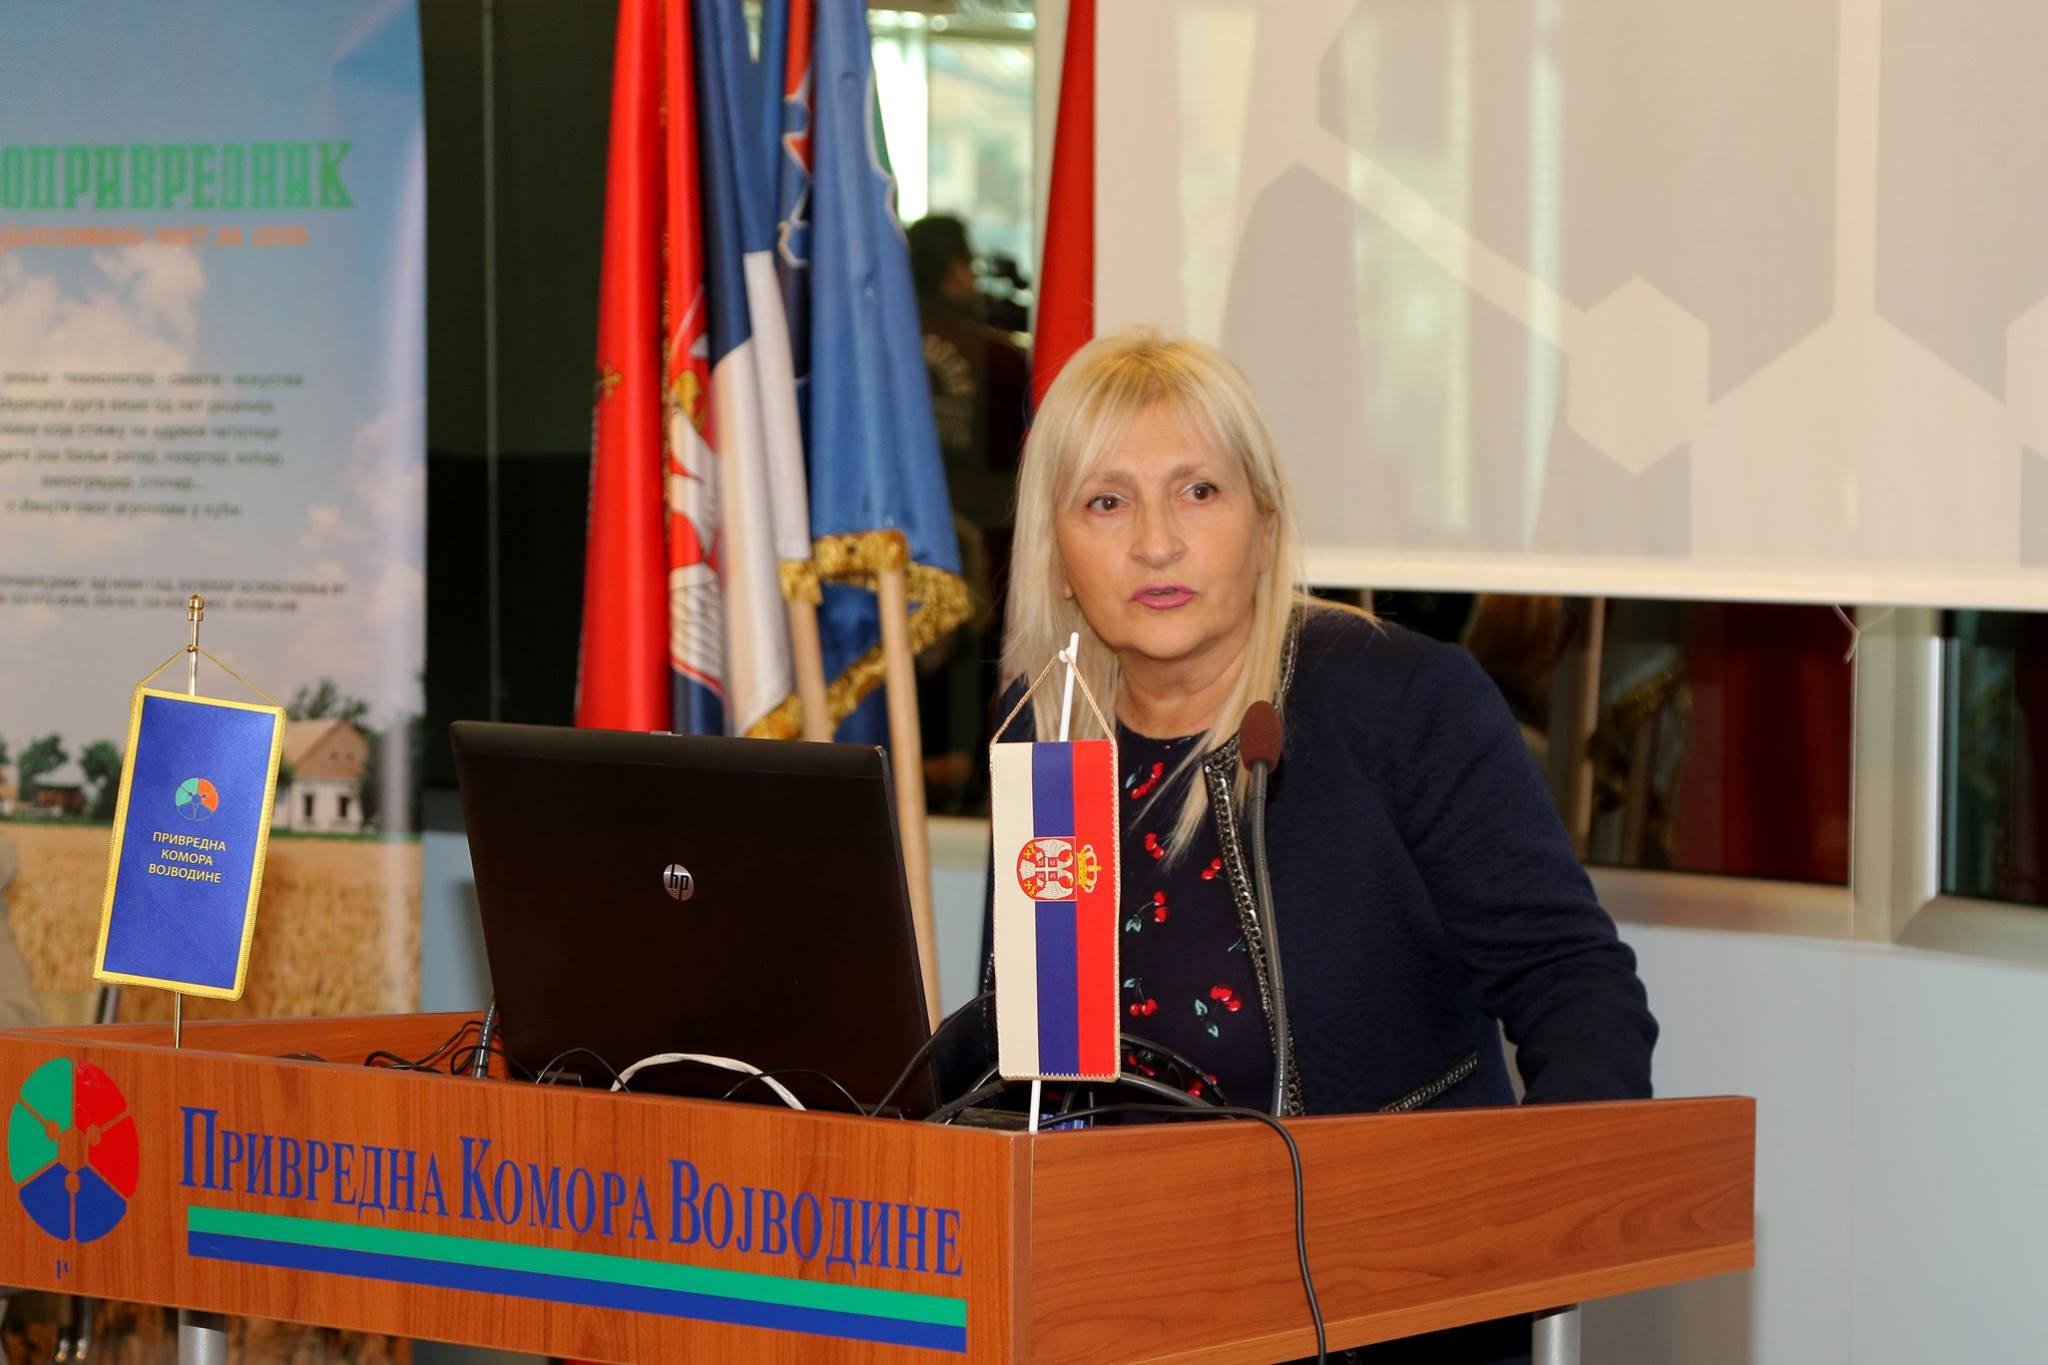 Jelena Drobnjak